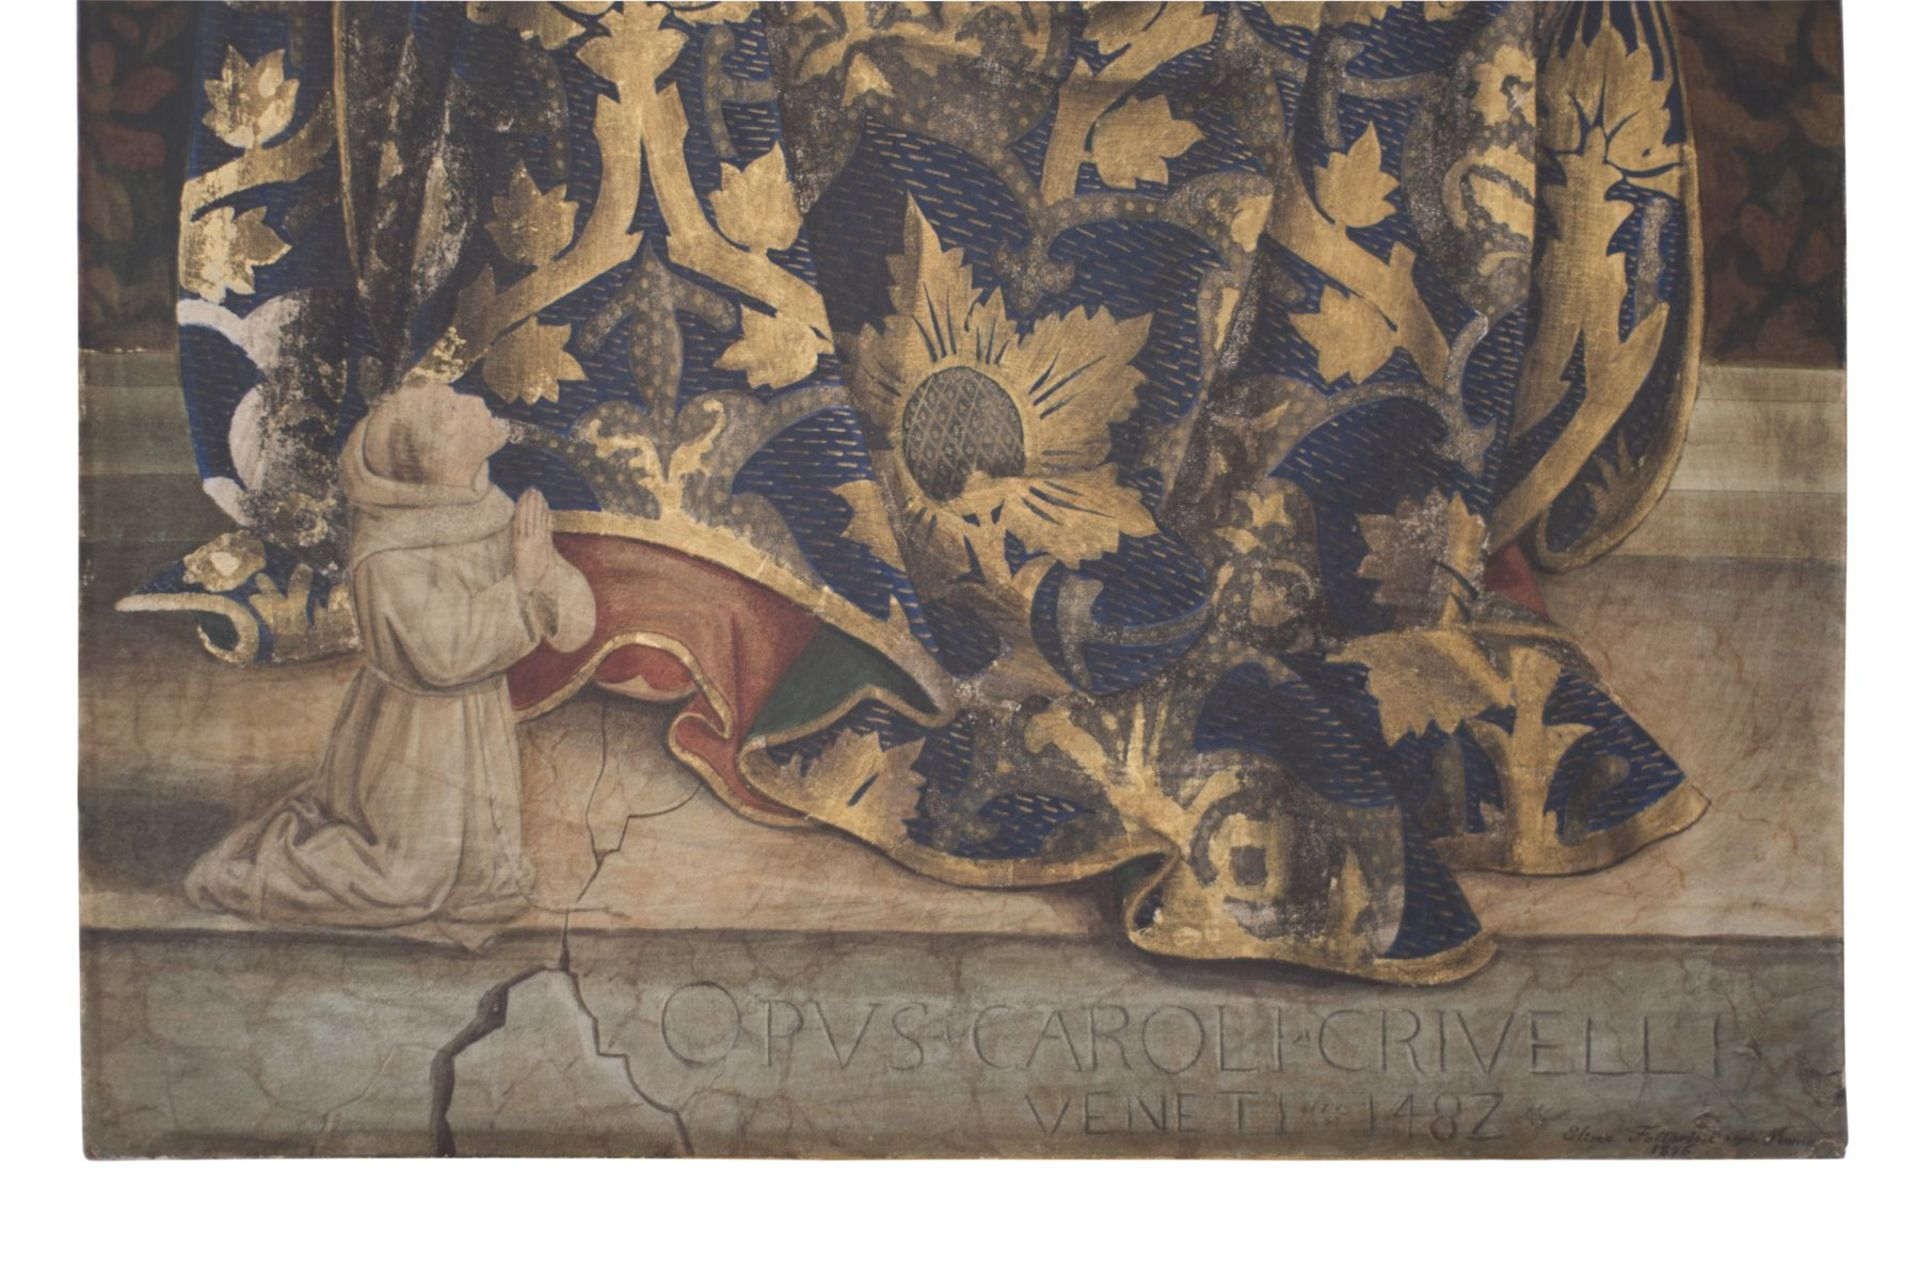 "After an original Opvus Caroli Crivelli Venet 1487 ""Madonna with Child"" - Image 7 of 8"